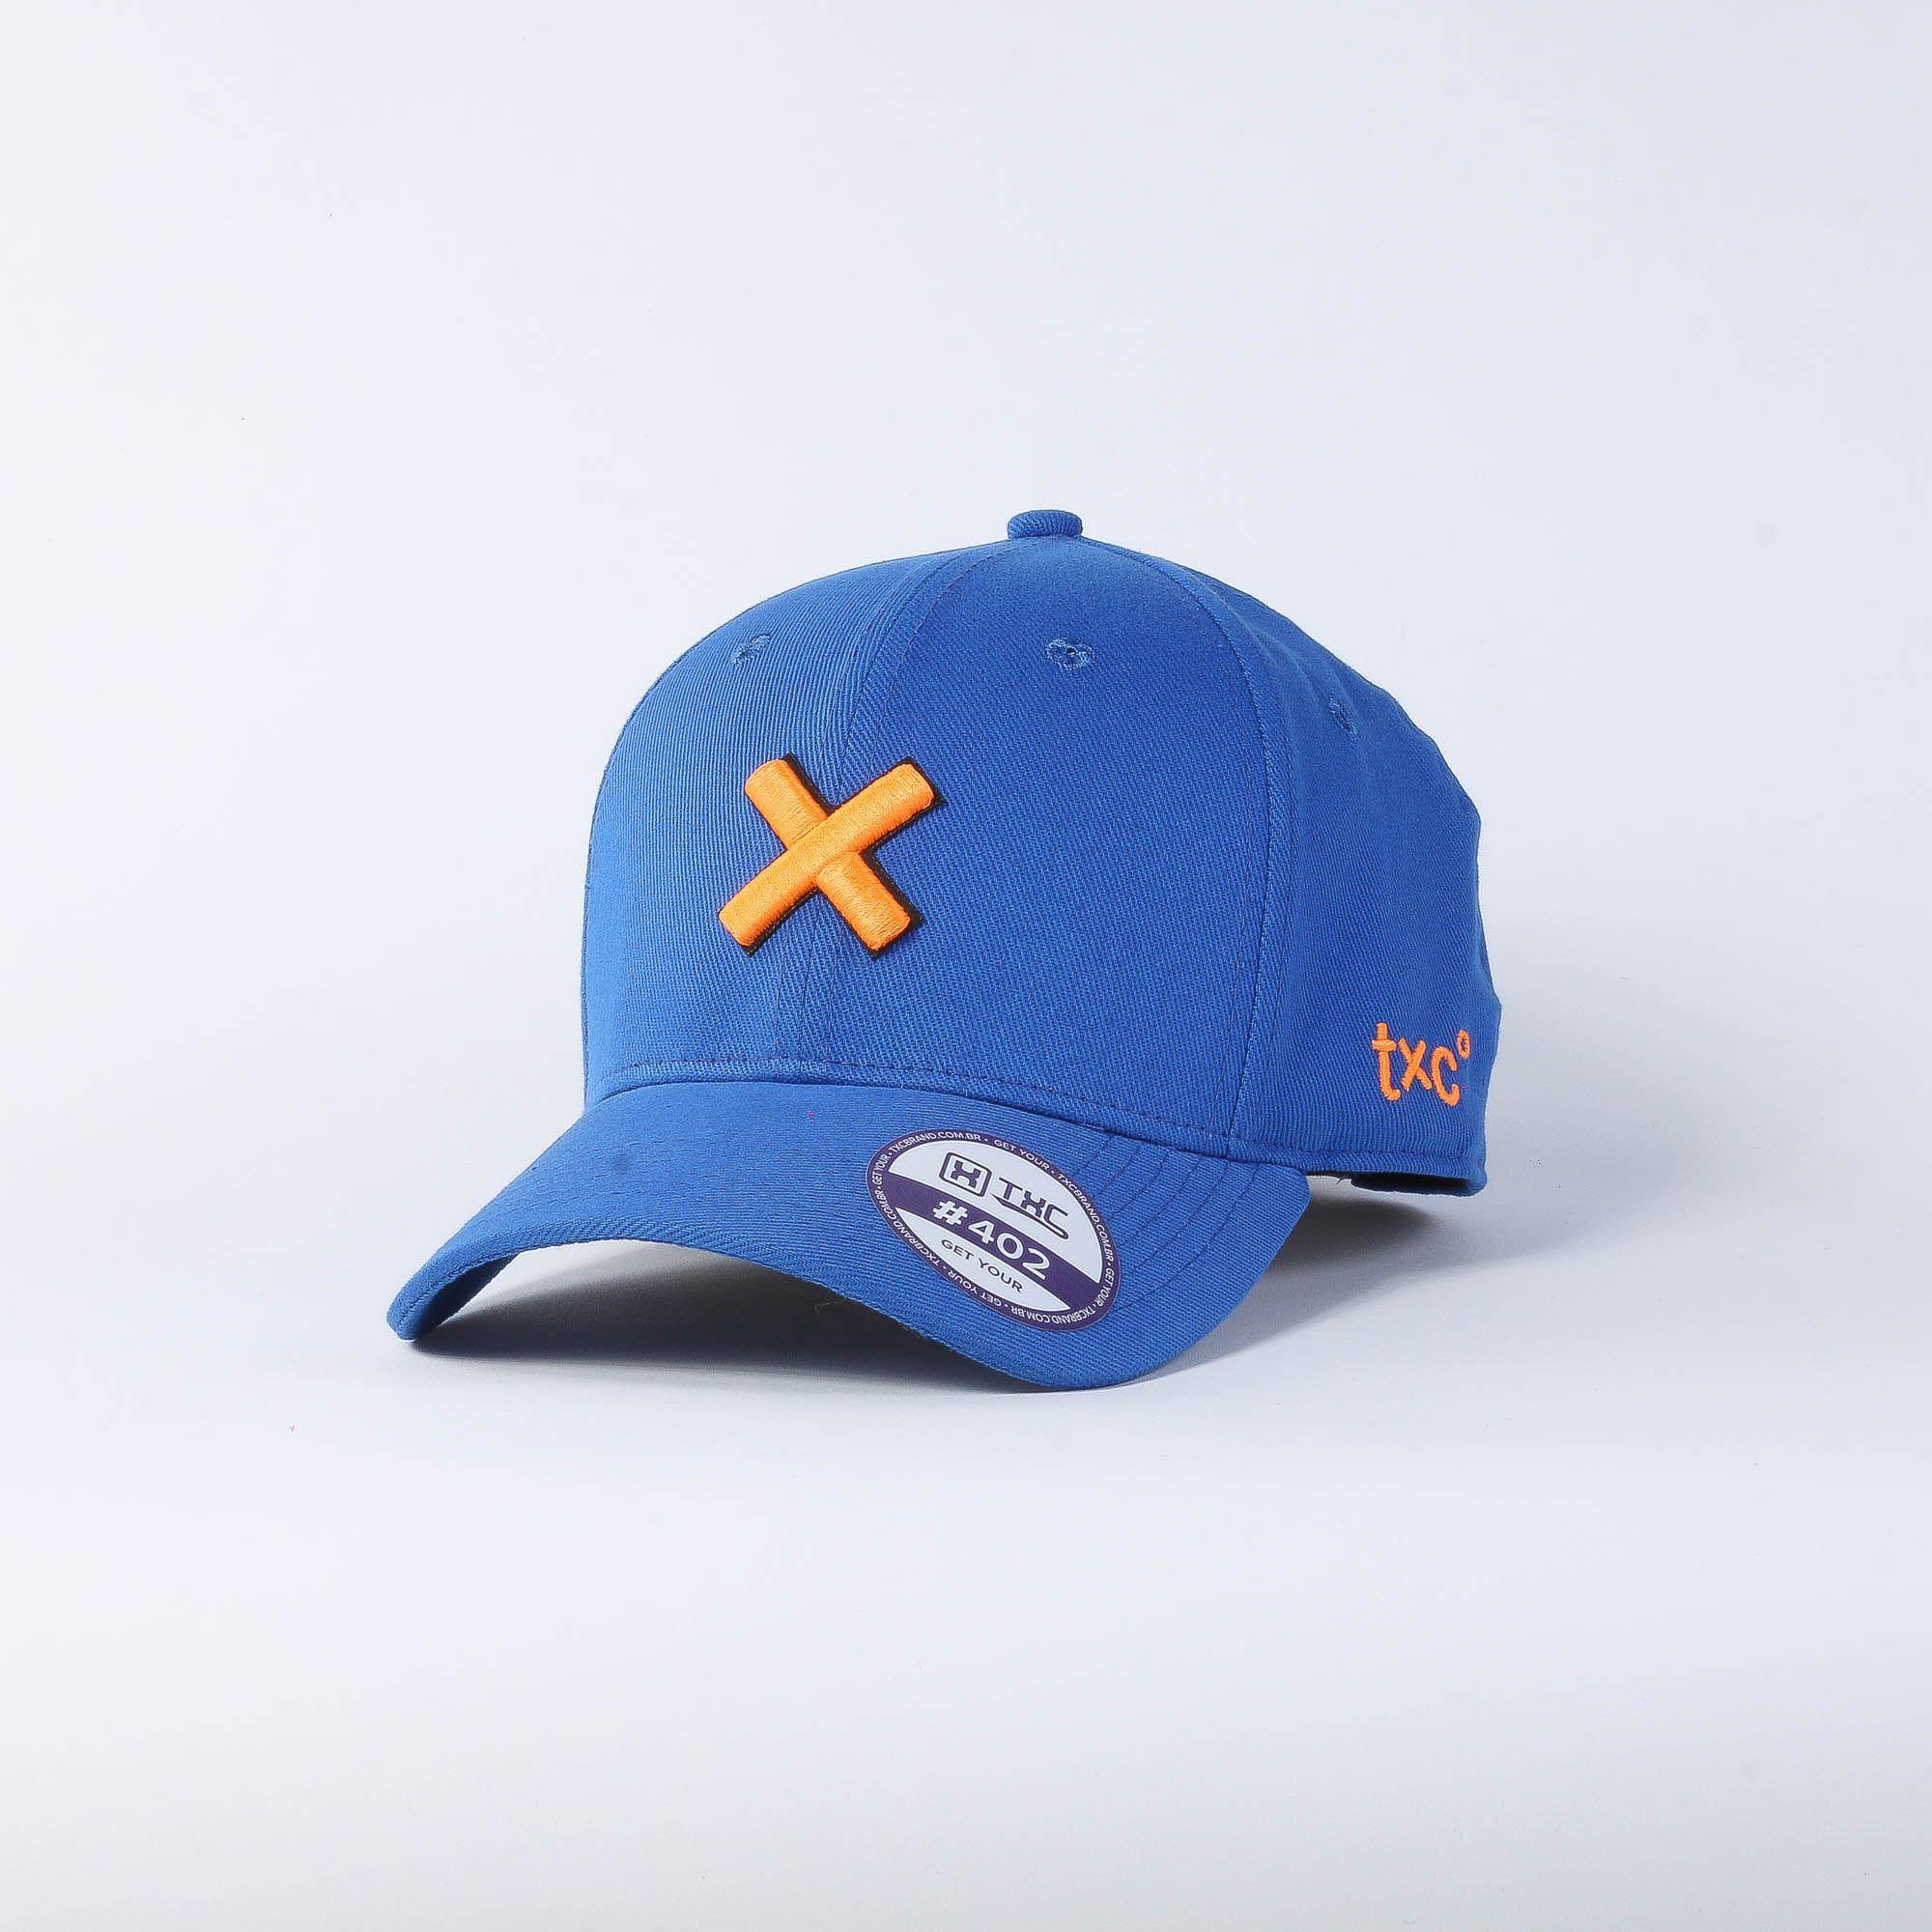 Boné TXC Brand aba curva 741C